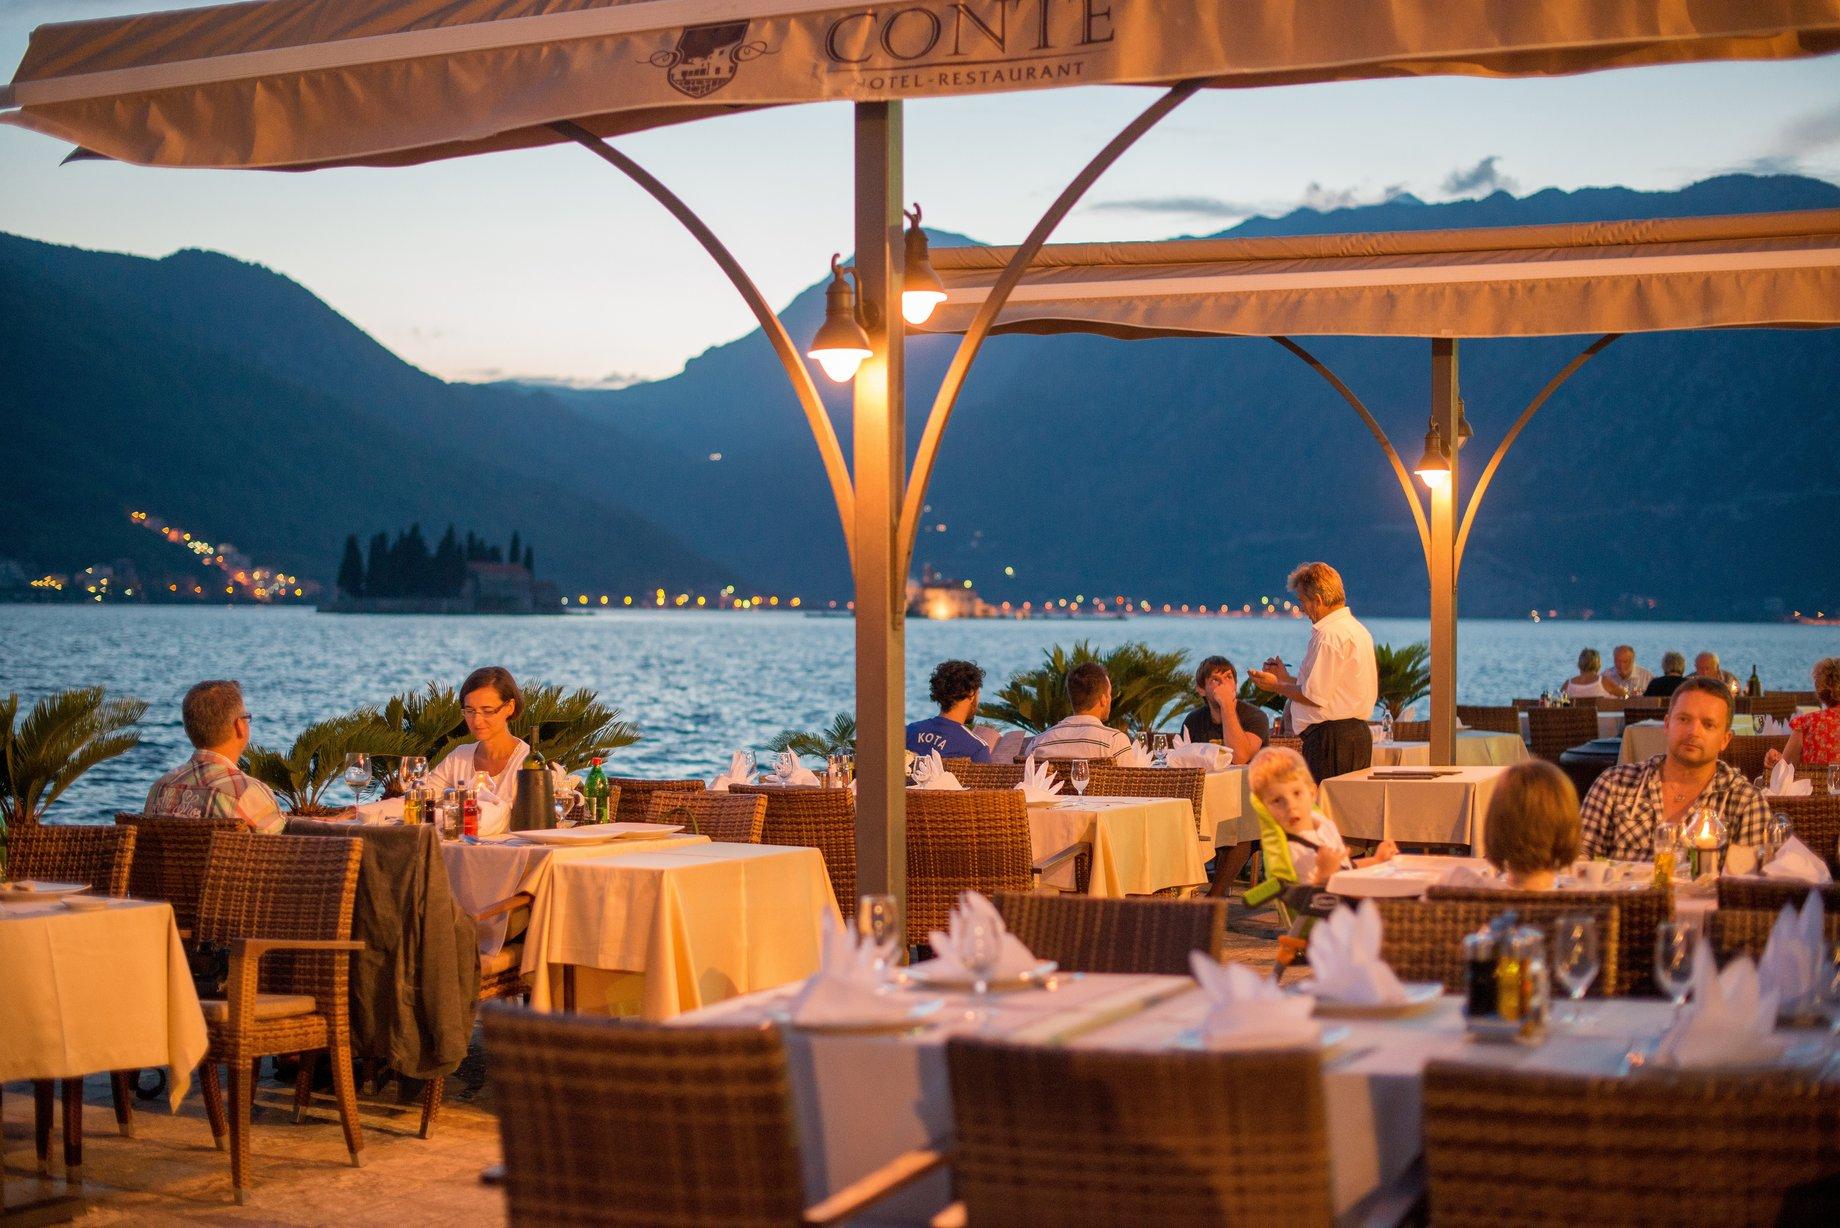 Hotel - restaurant Conte Perast cover photo